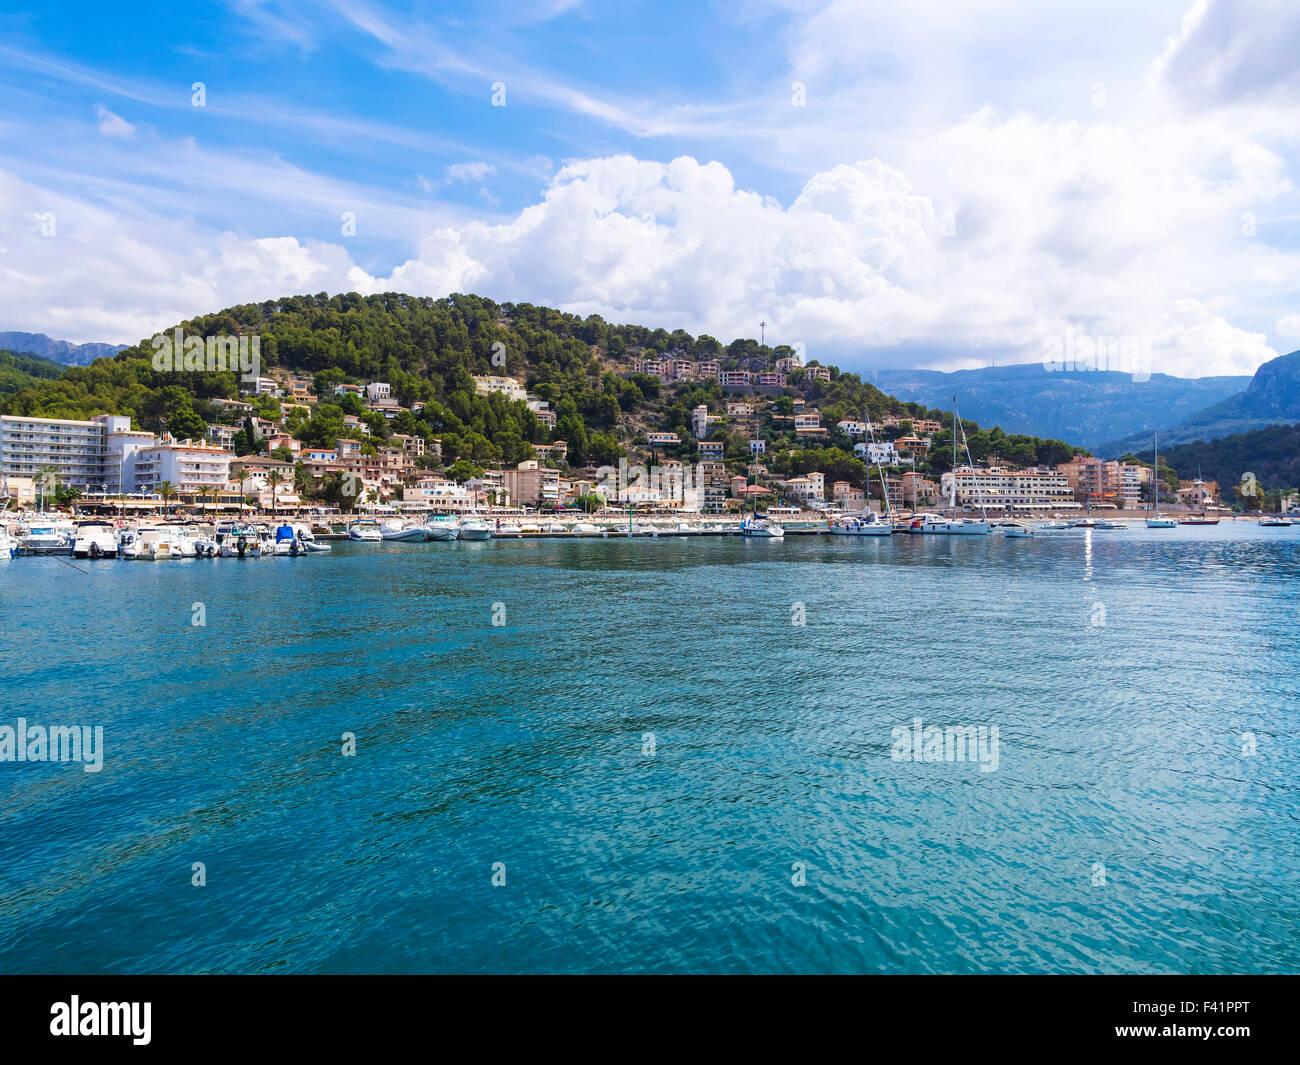 View of Port de Soller marina, Soller, Mallorca, Balearic Islands, Spain - Stock Image